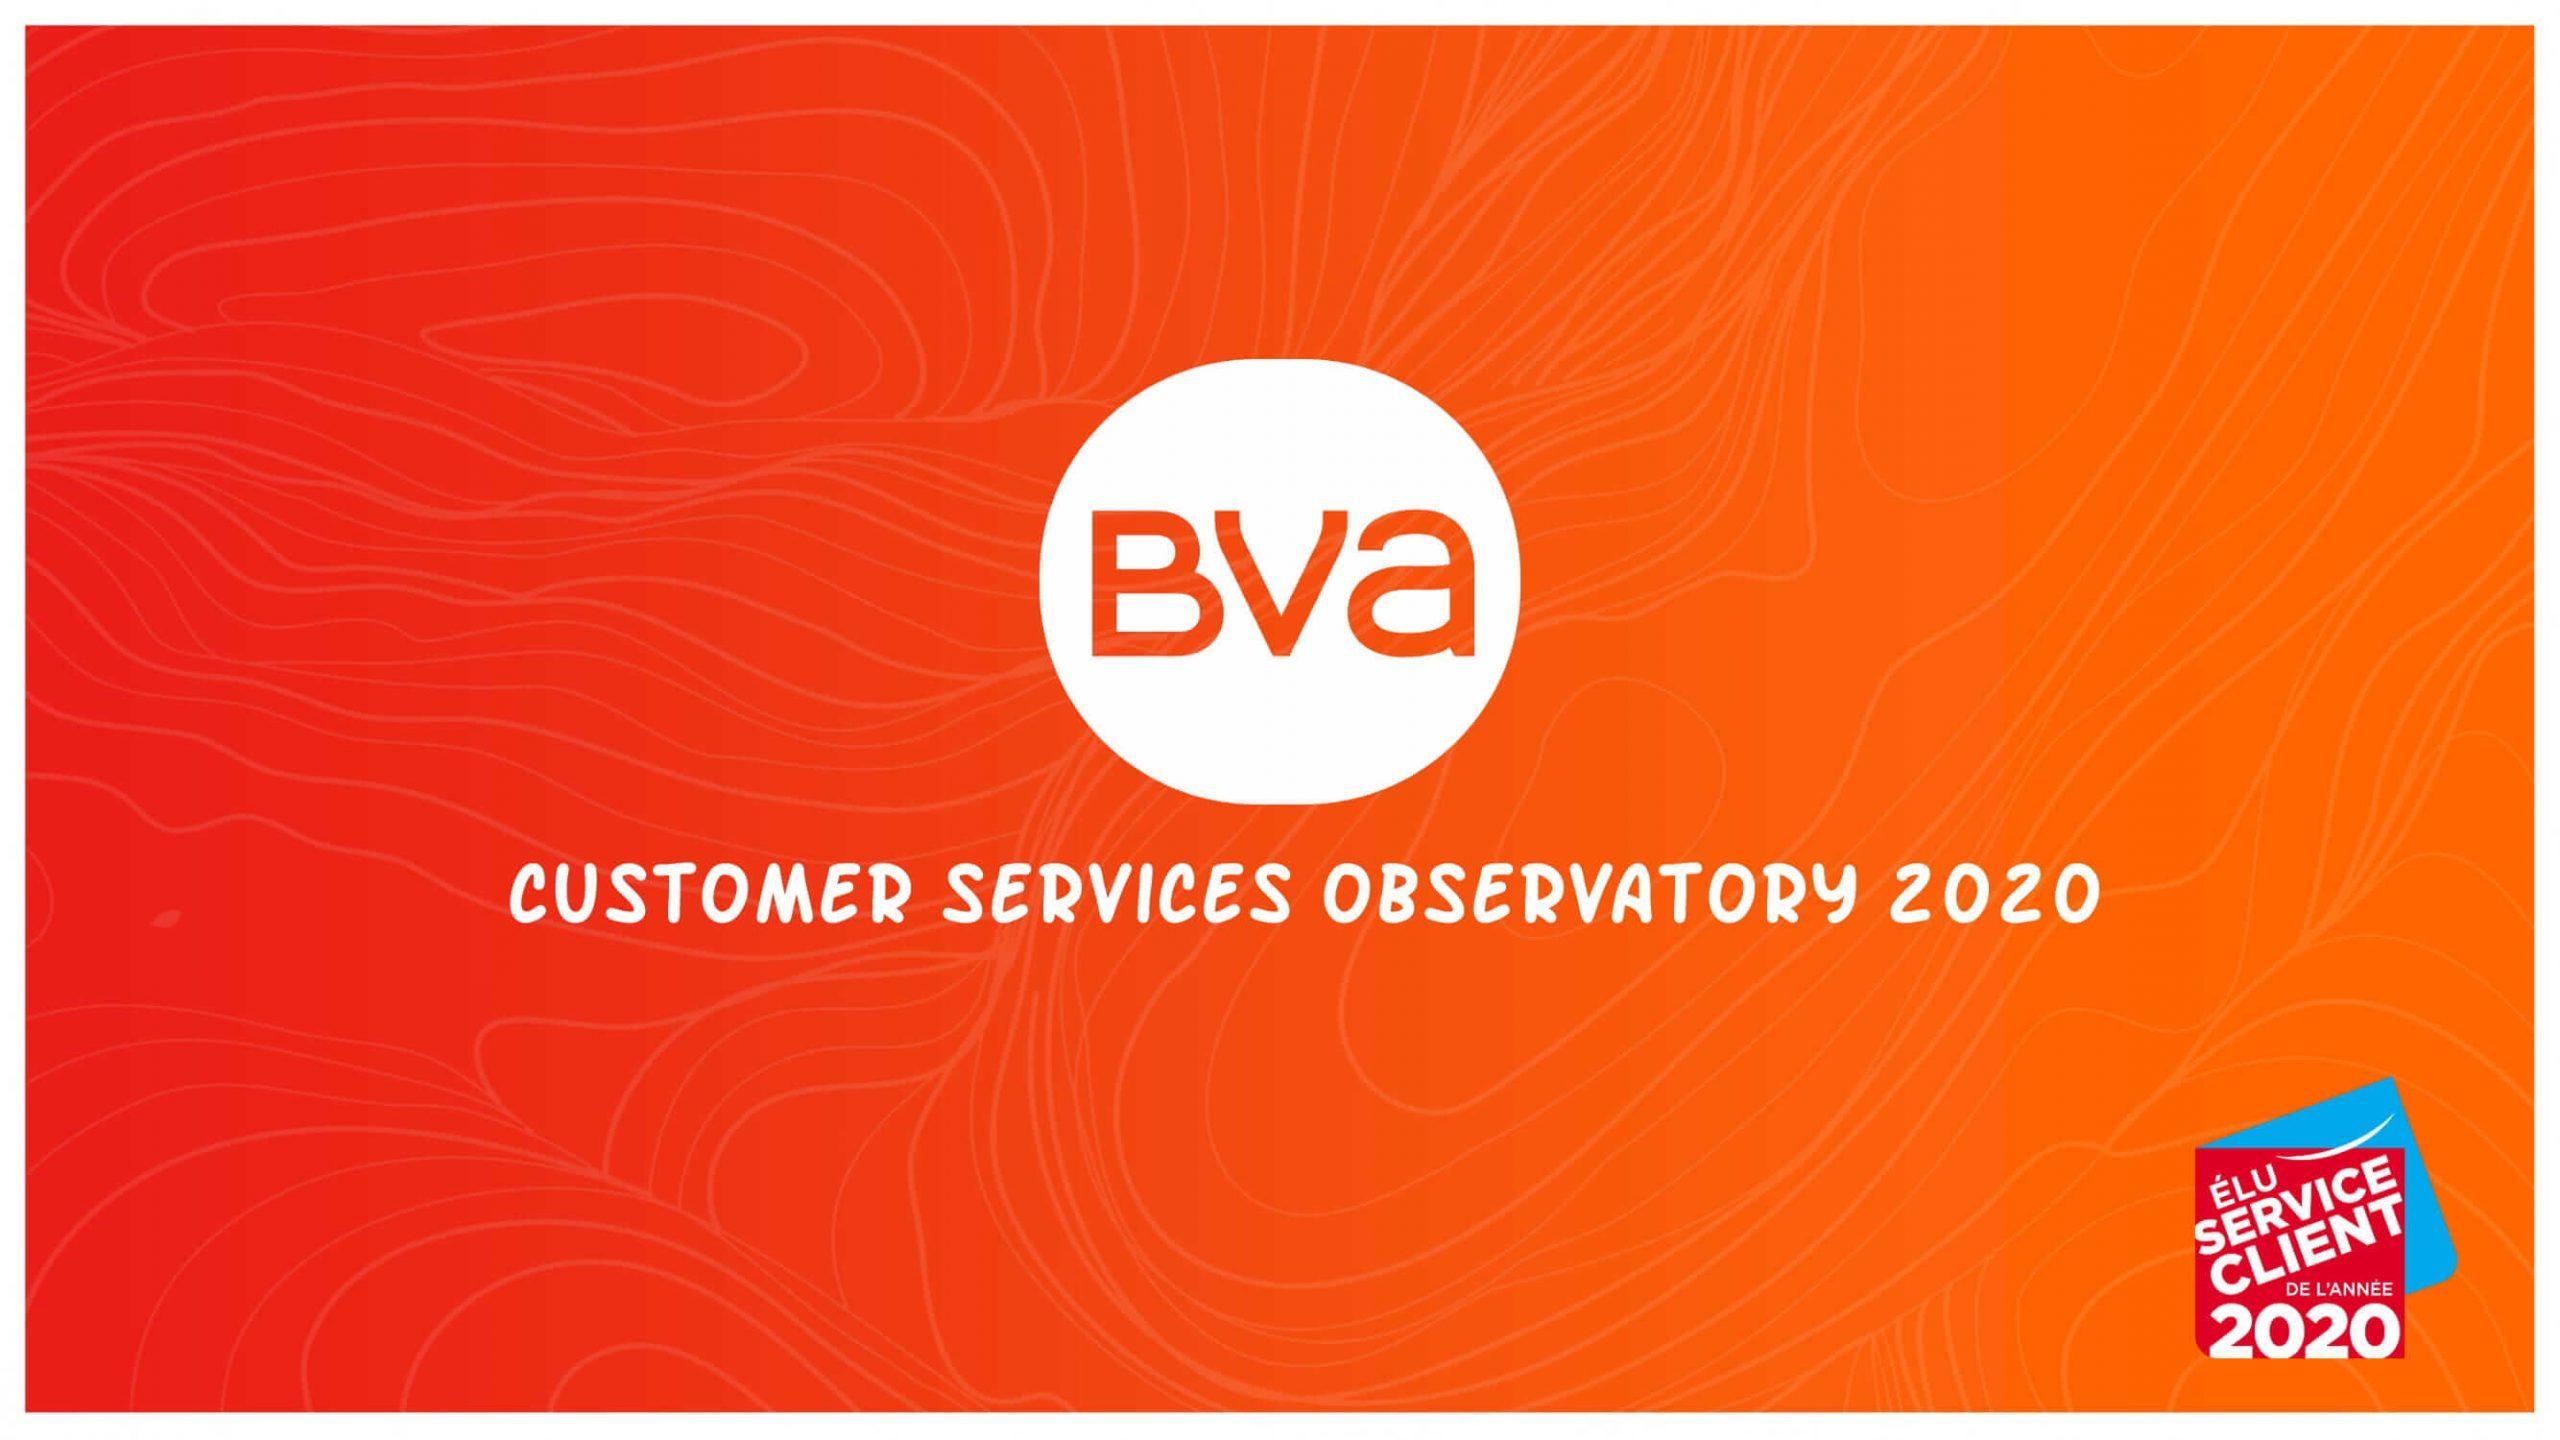 Escda Bva Observatoire Des Services Clients 2020 Benchmark 01